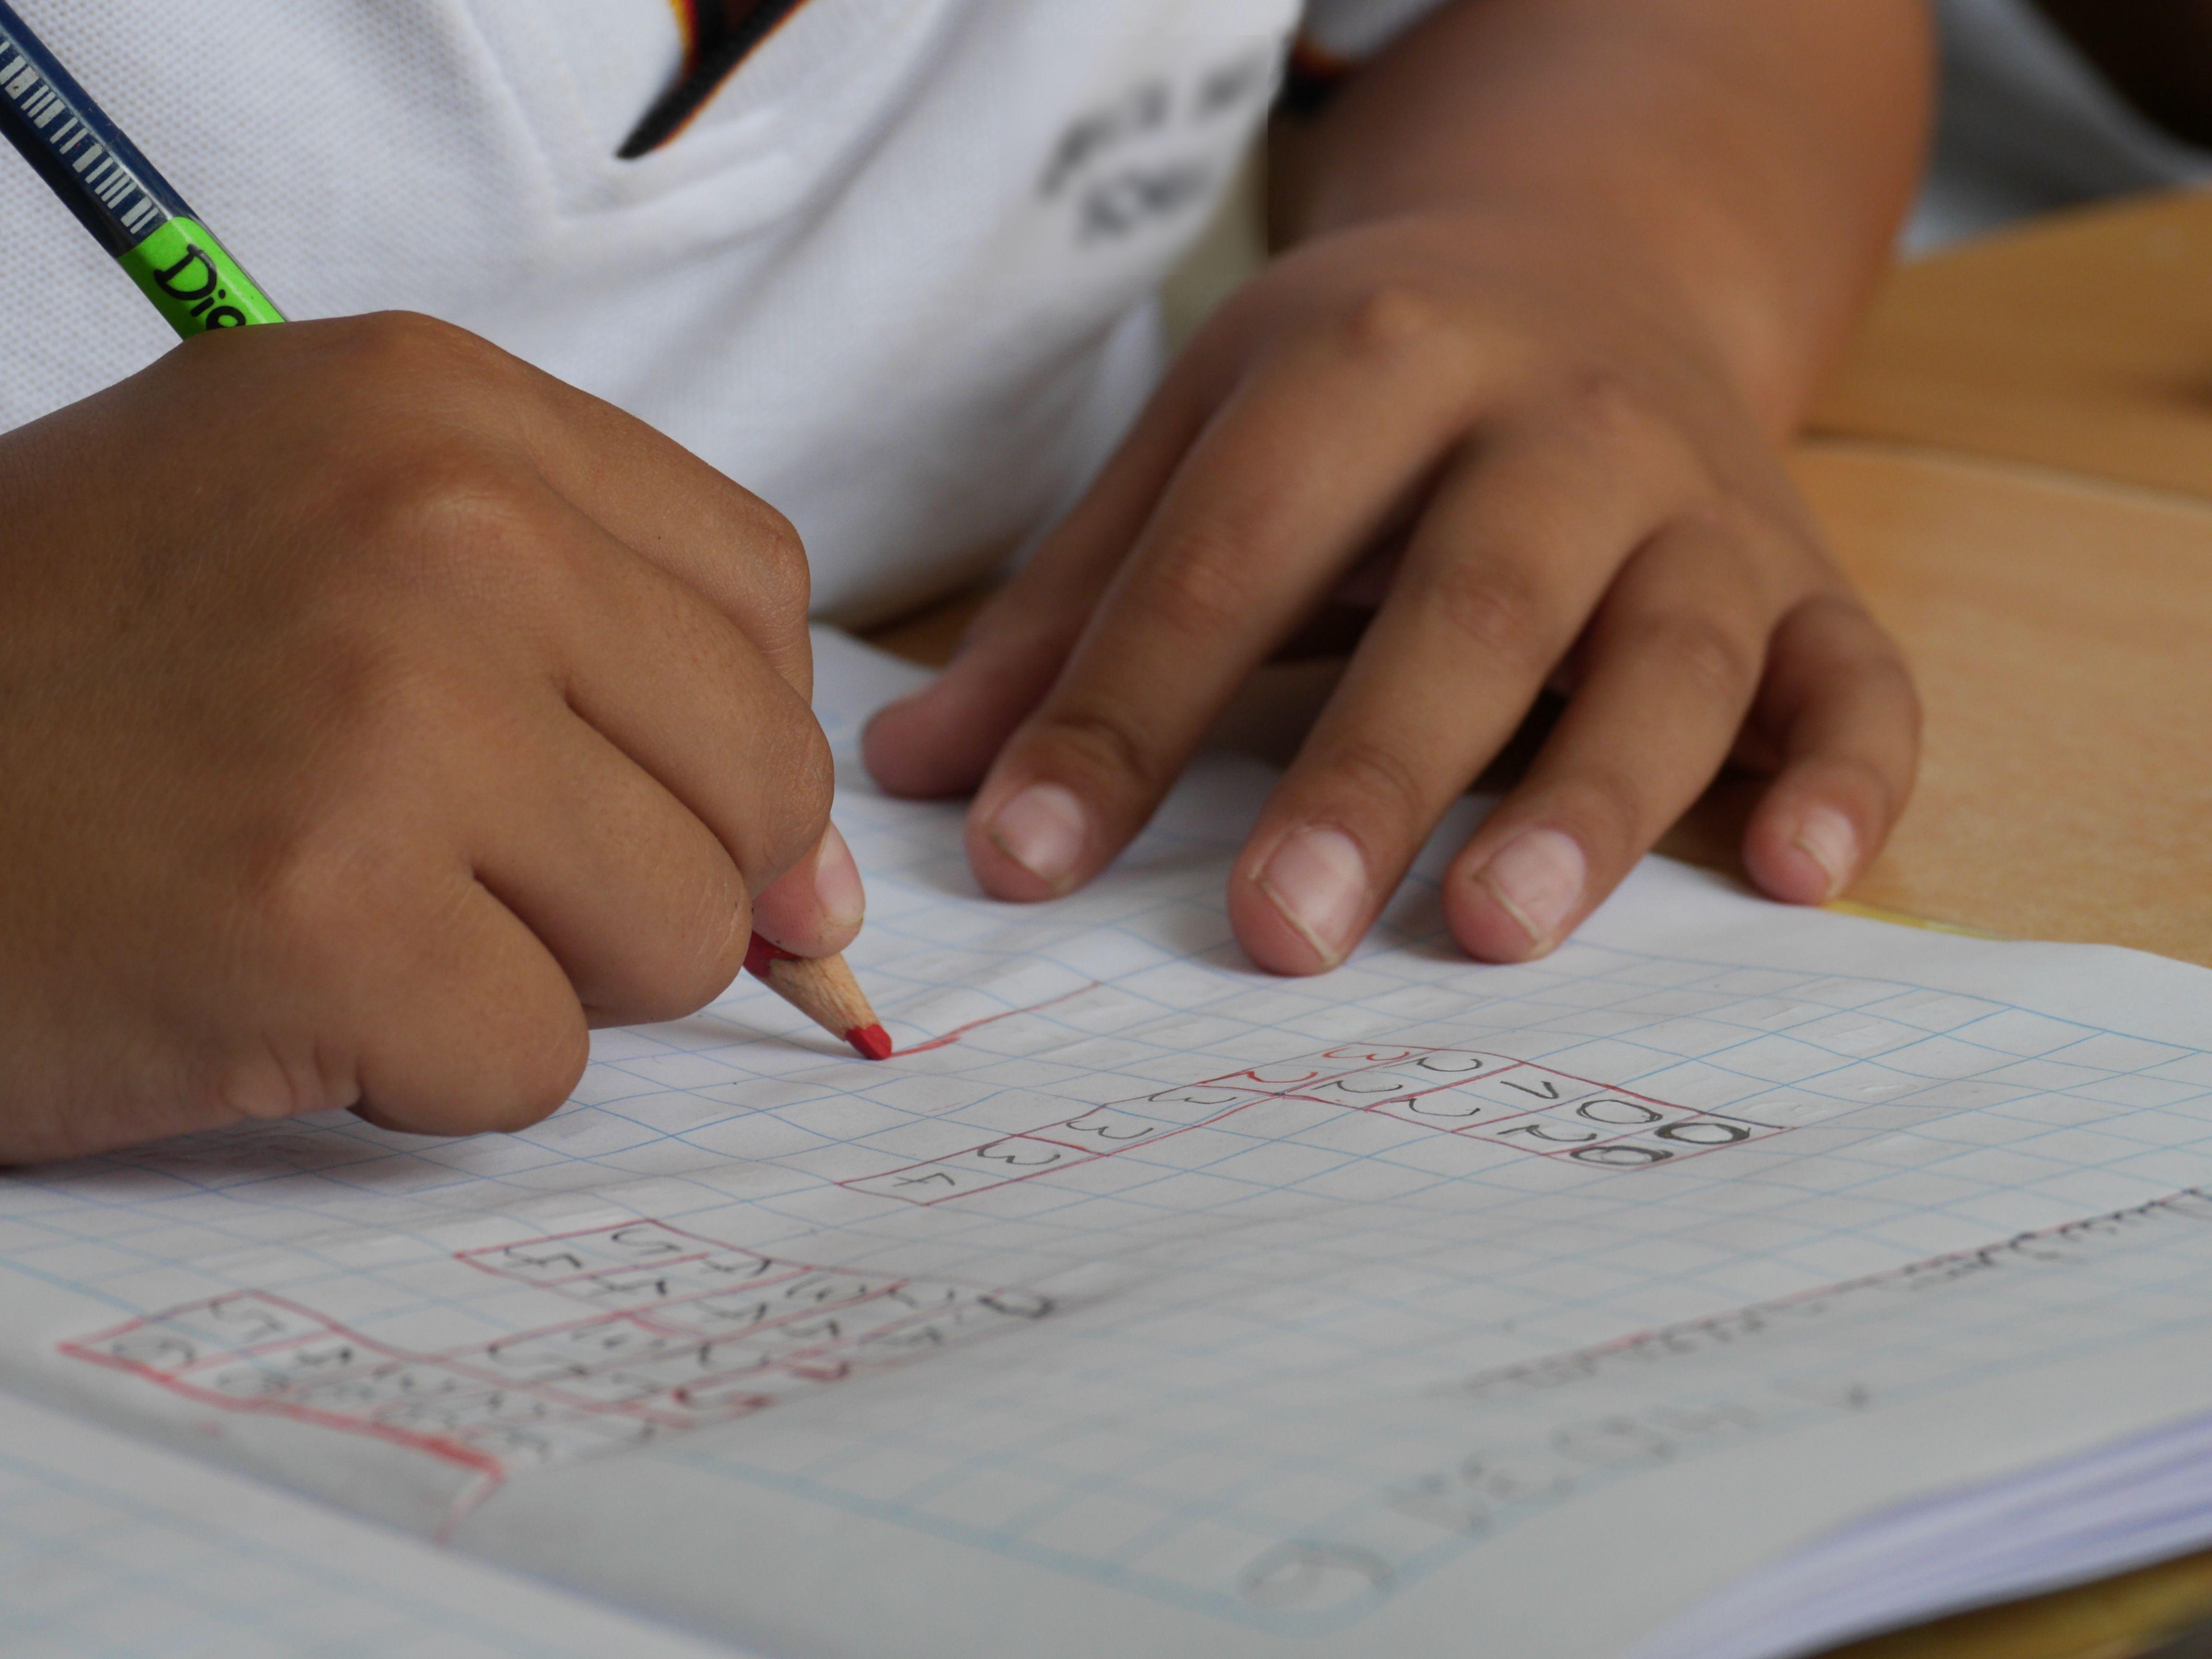 enfant-ecole-education.jpg